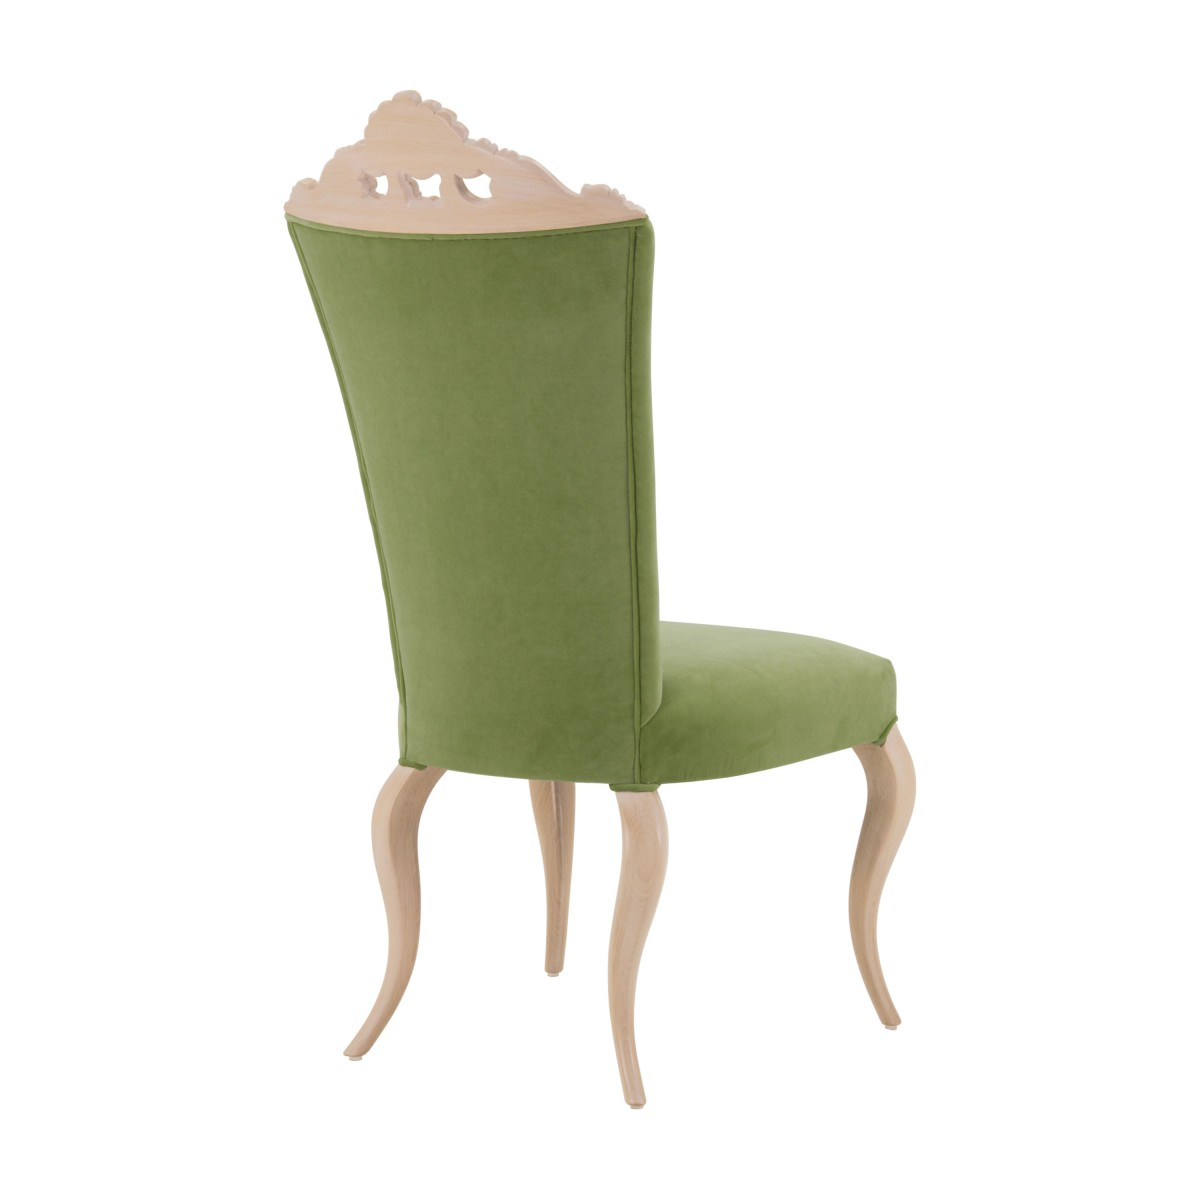 replica chair antesia 1 3017